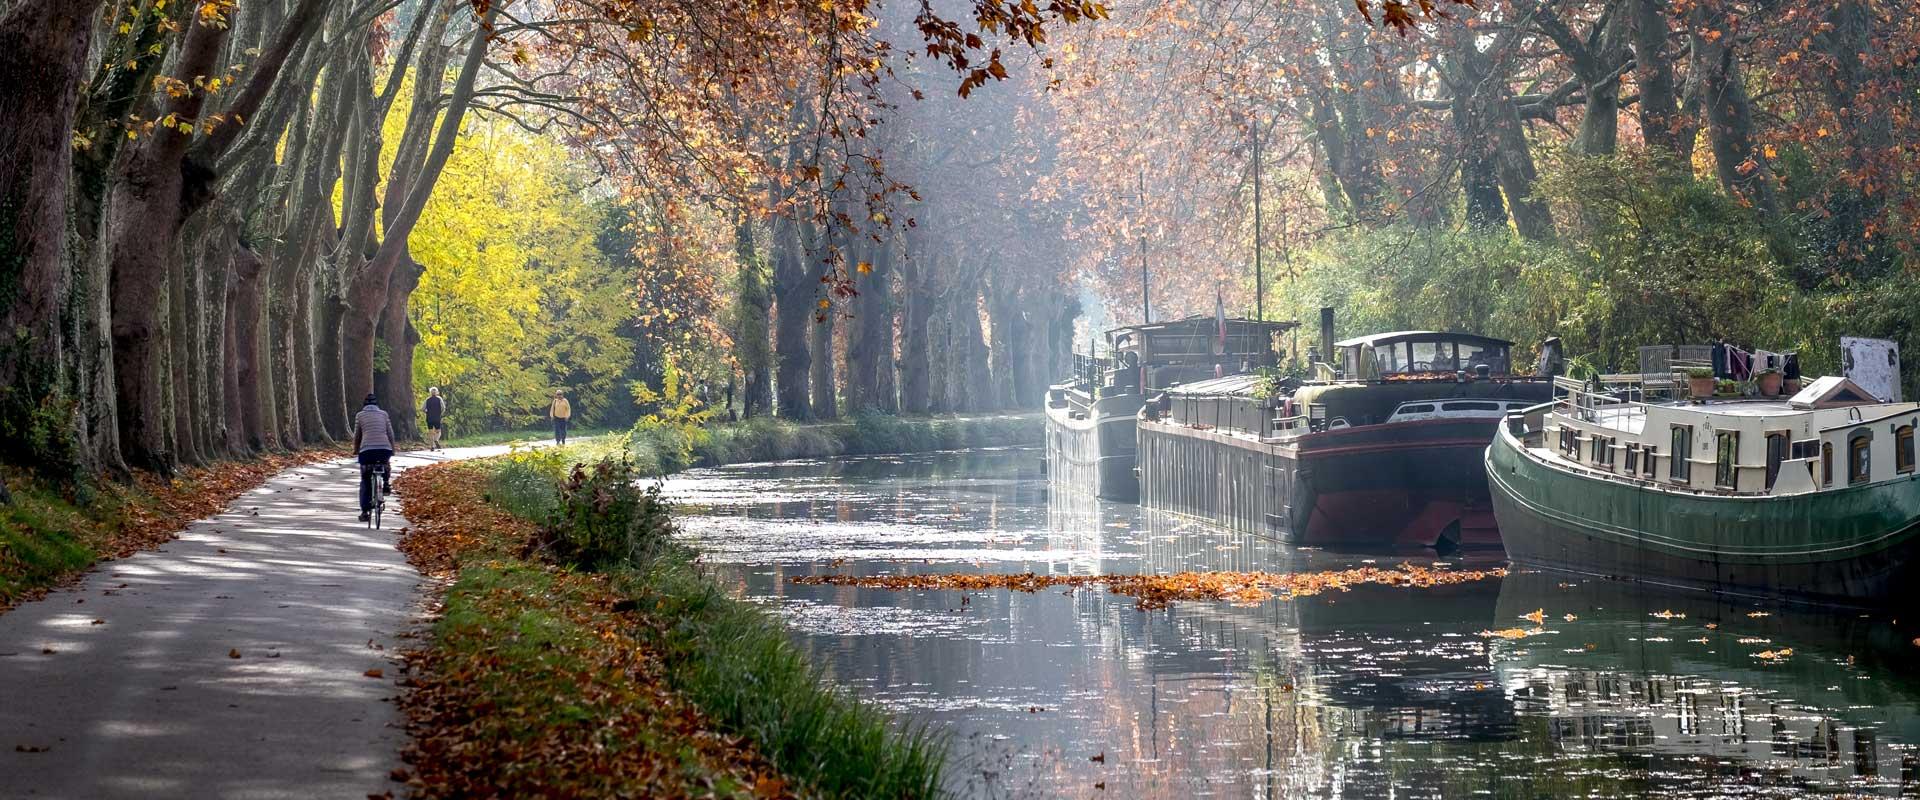 Canal du Midi Cycling